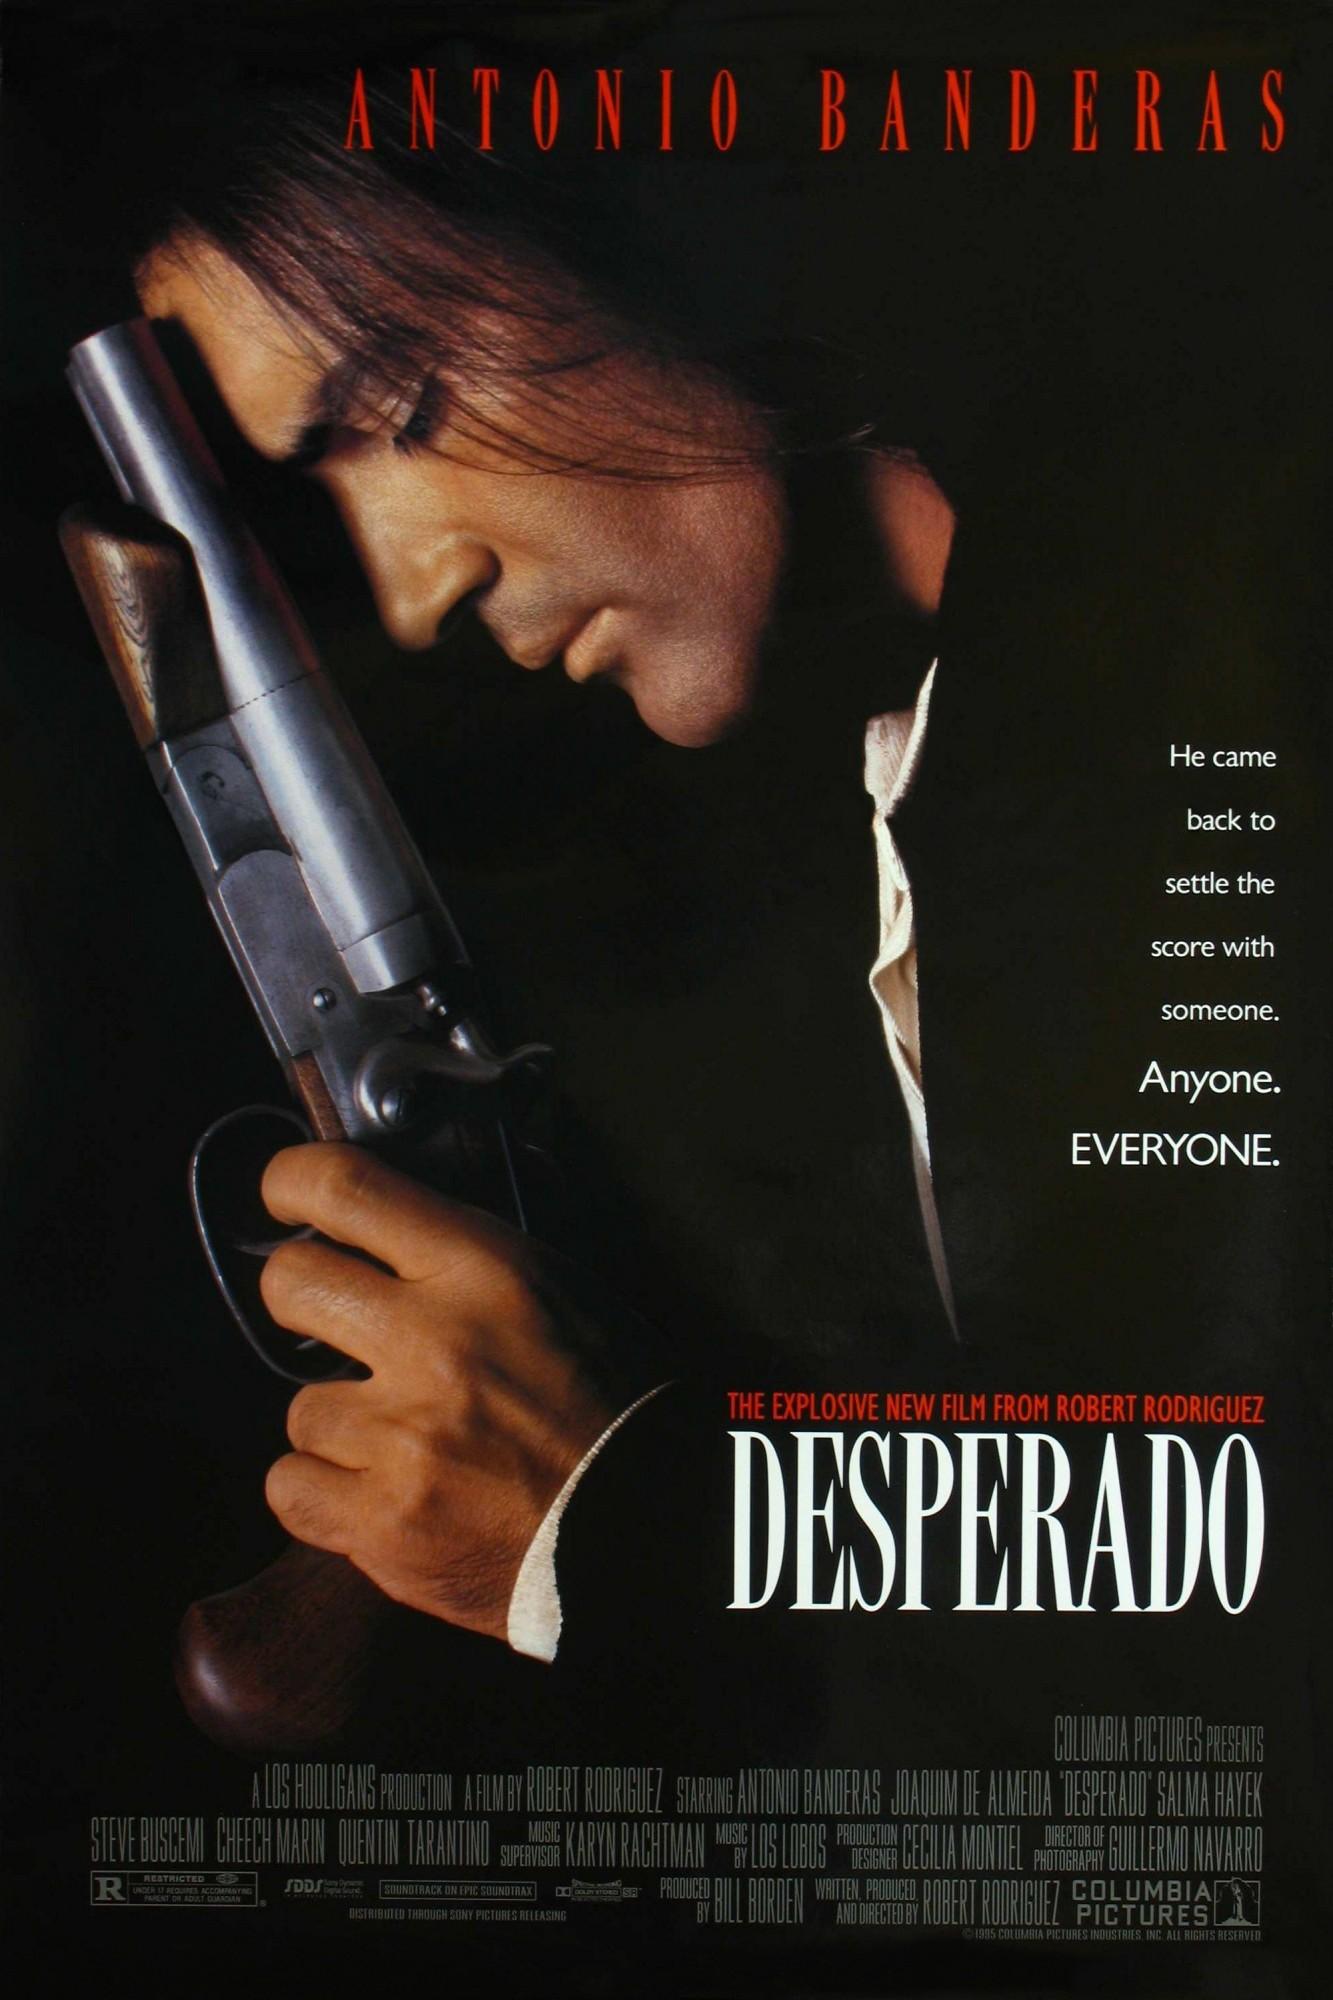 Desperado (Film)